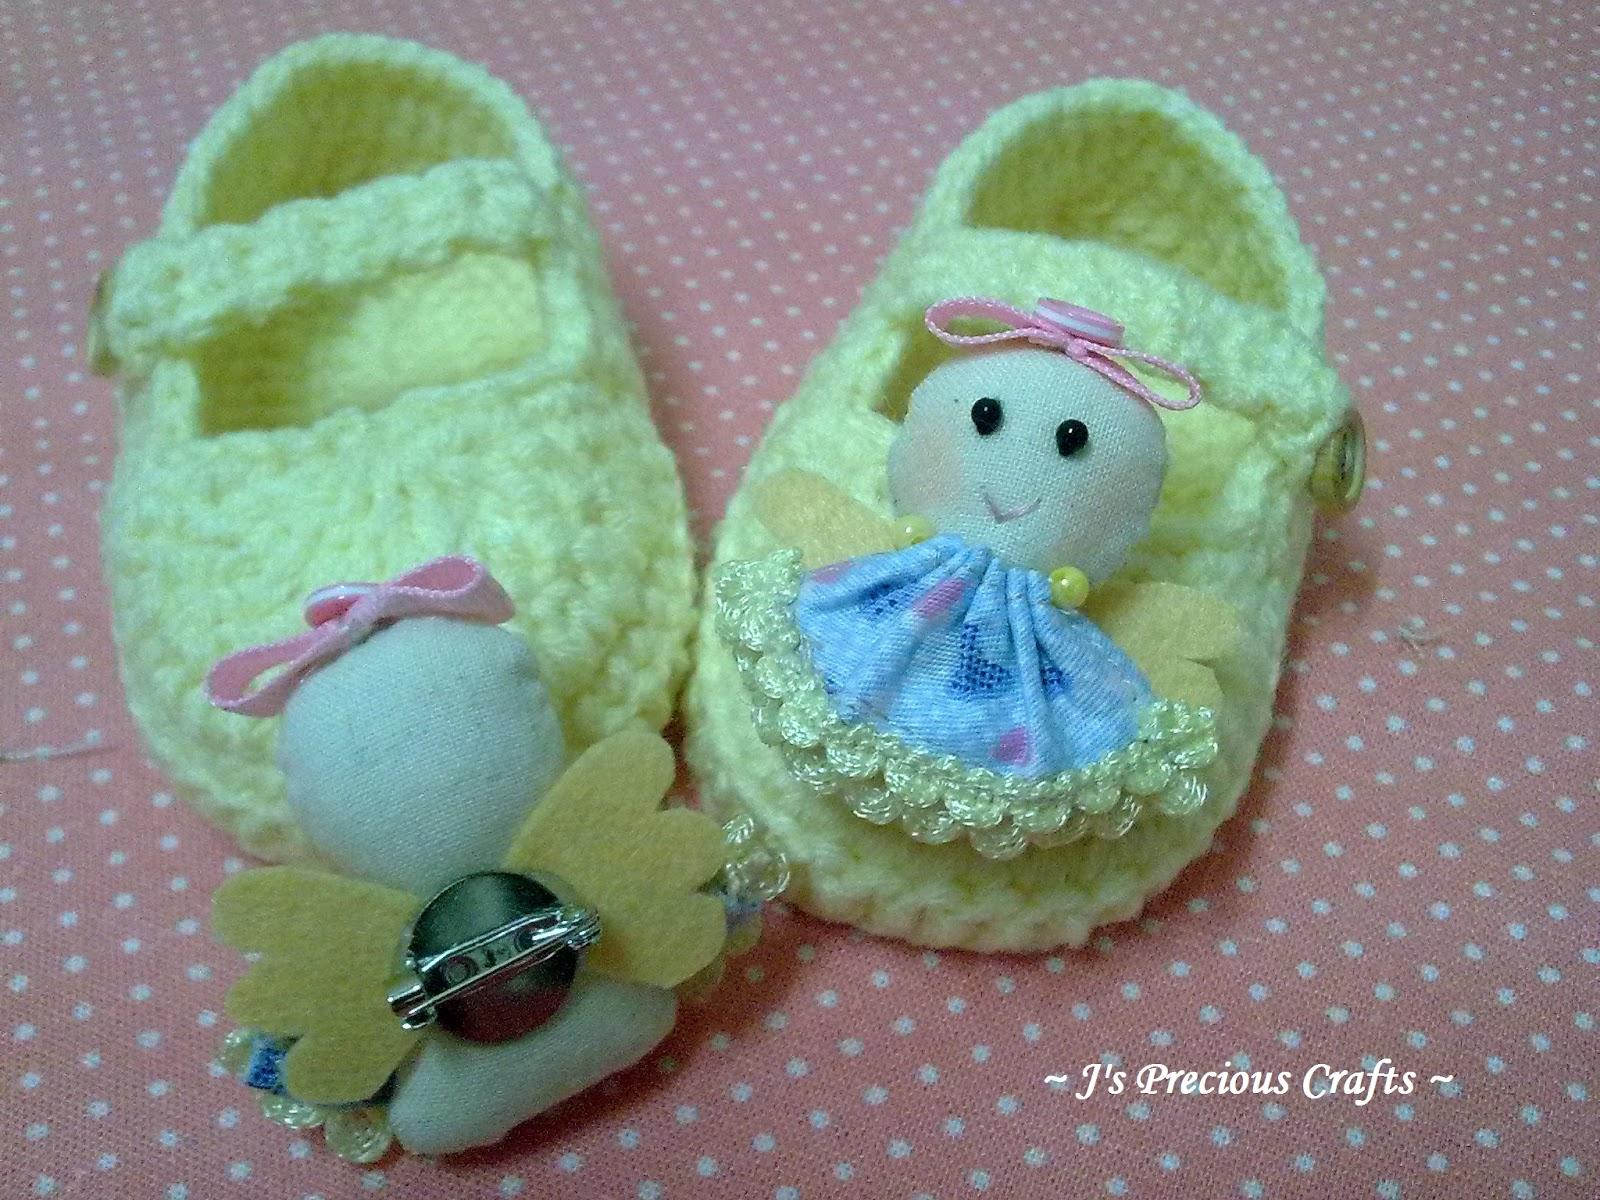 j s precious crafts 小天使婴儿鞋 客订 Little Angel Baby Shoe